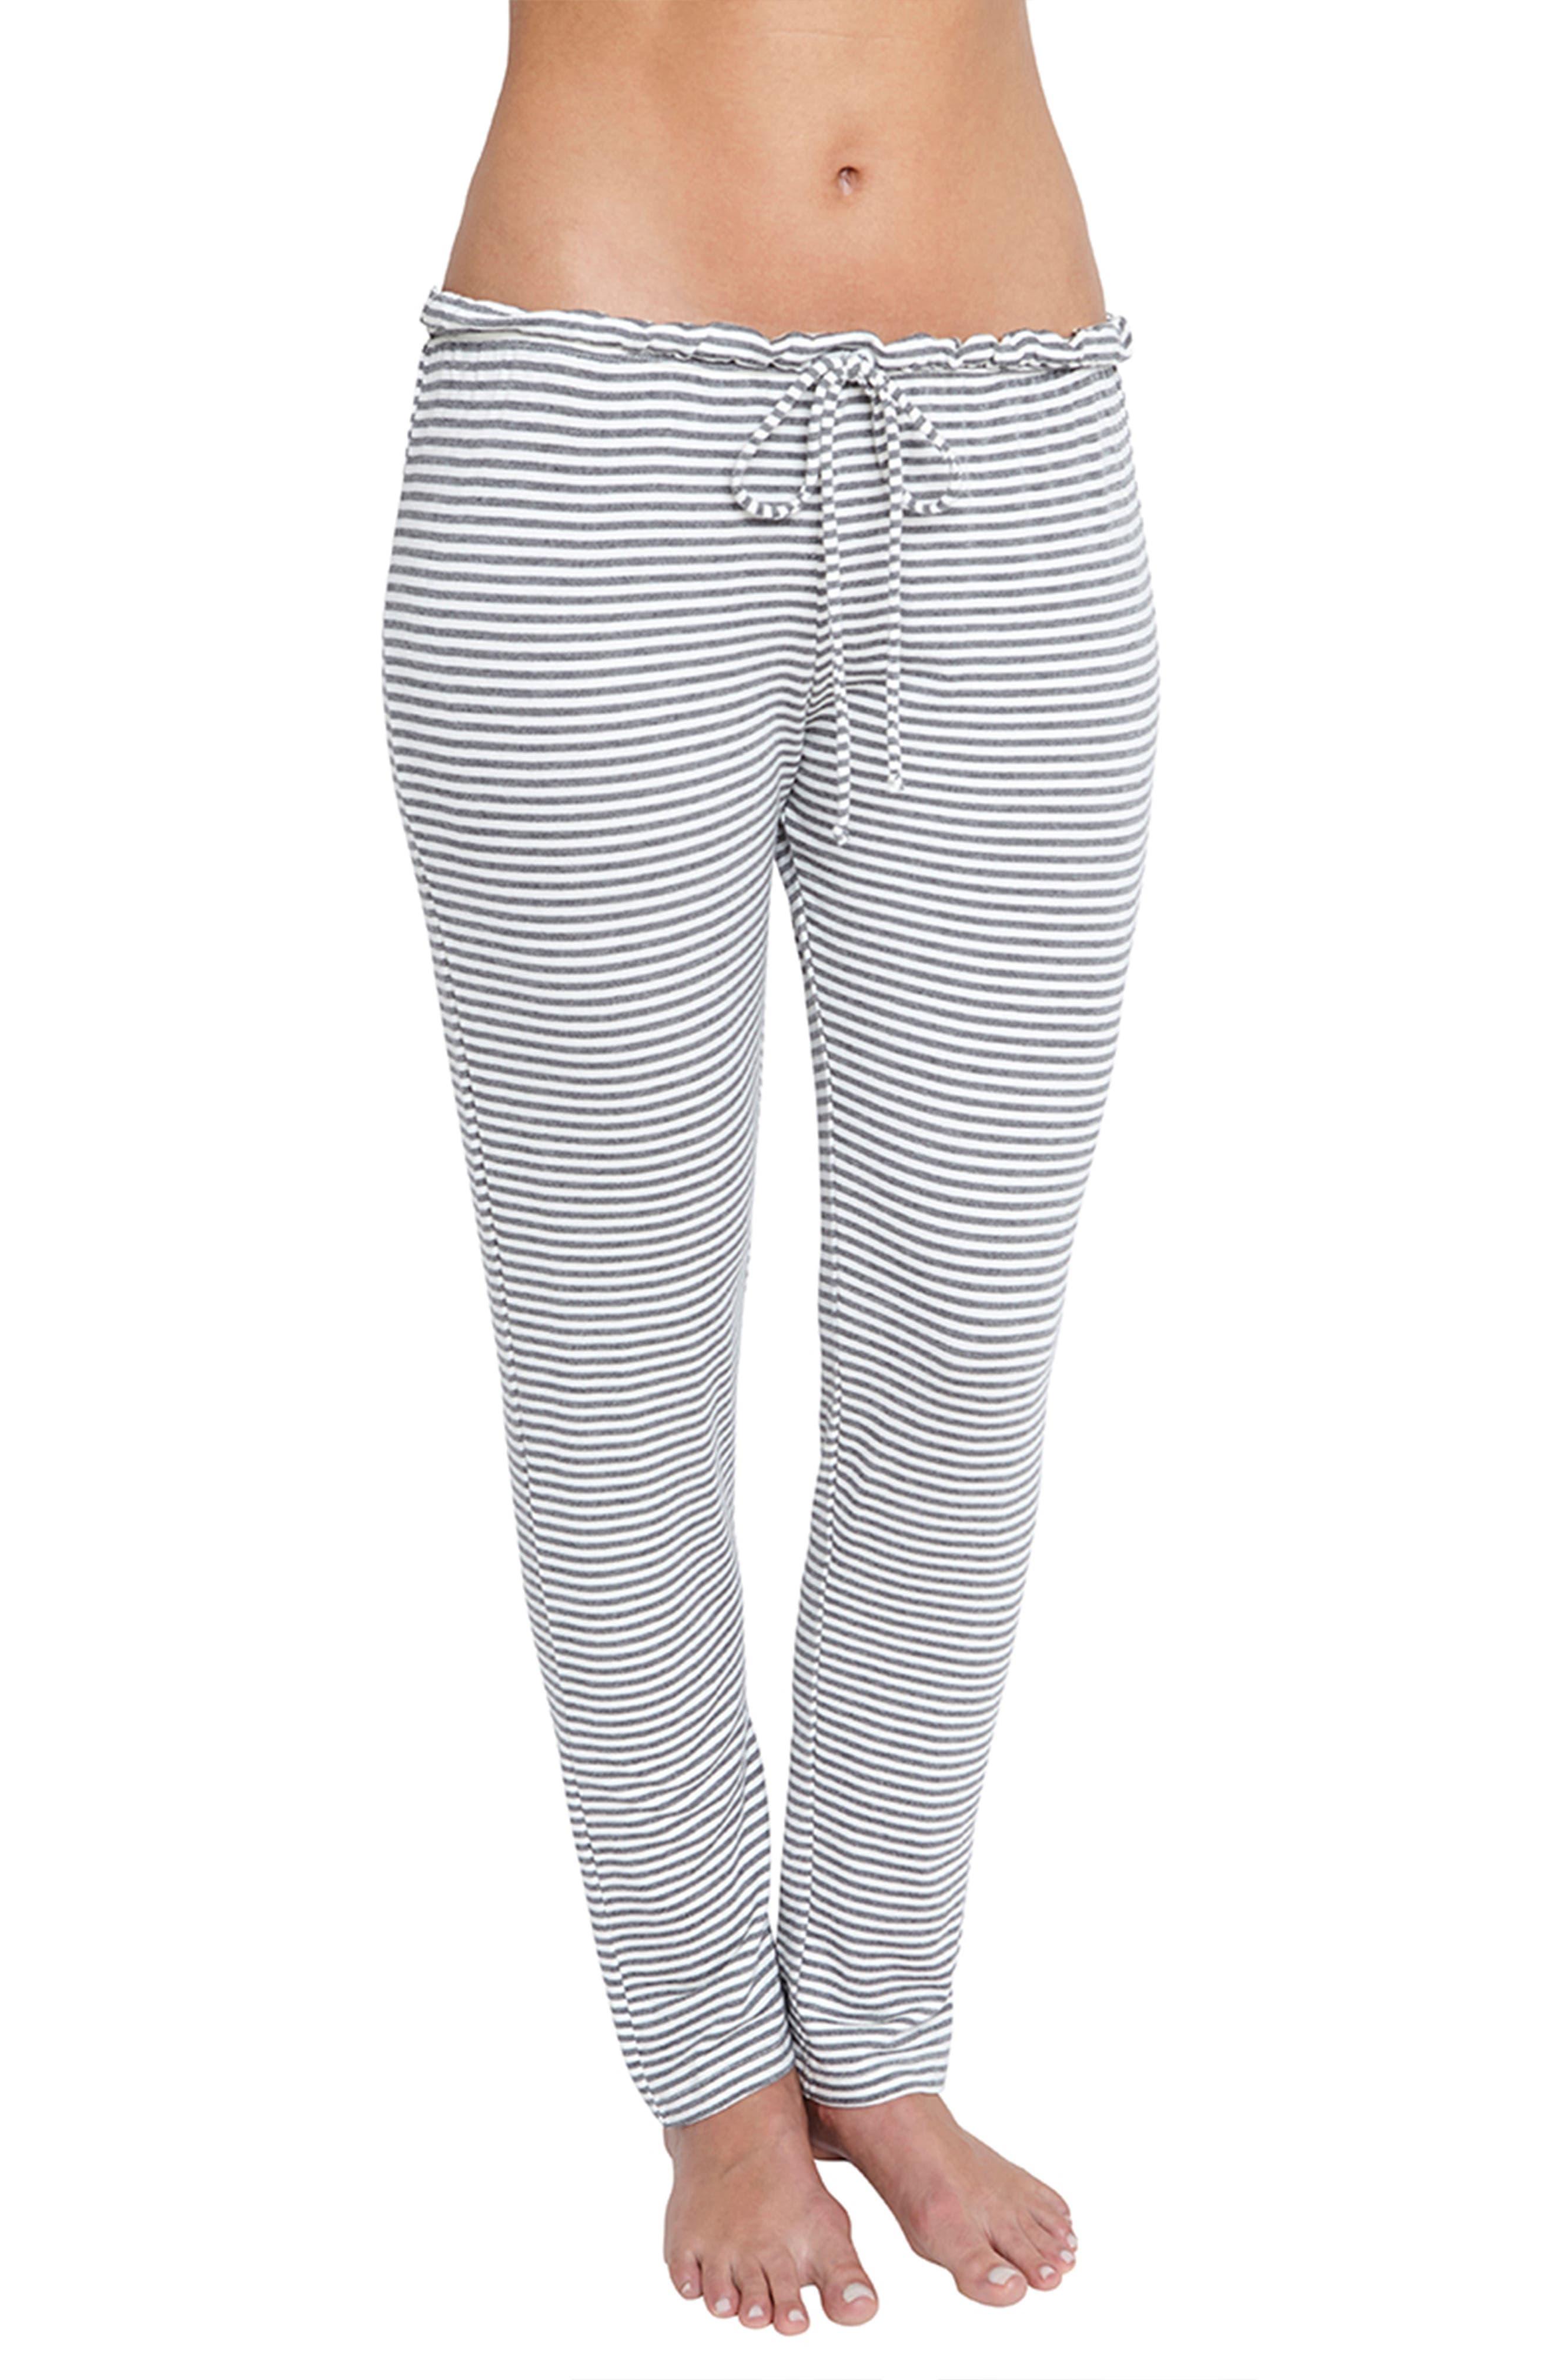 Sadie Stripes Pajama Pants,                         Main,                         color, 030